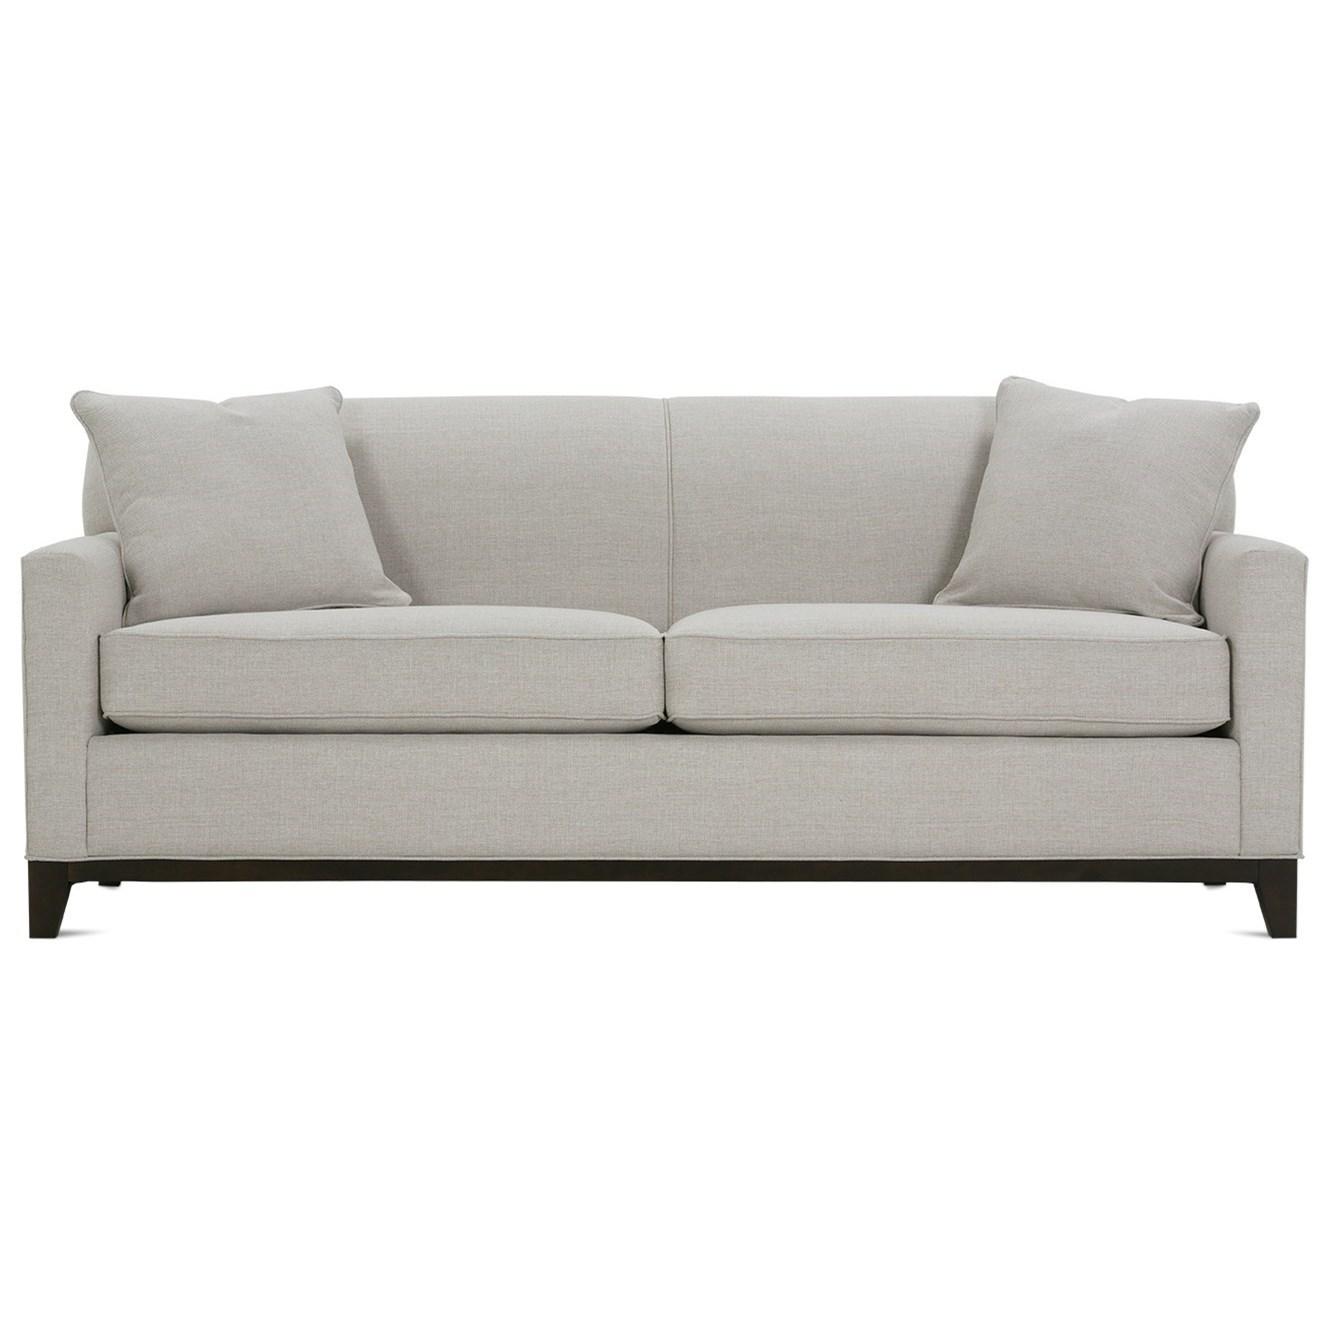 Martin Sofa Sleeper by Rowe at Baer's Furniture